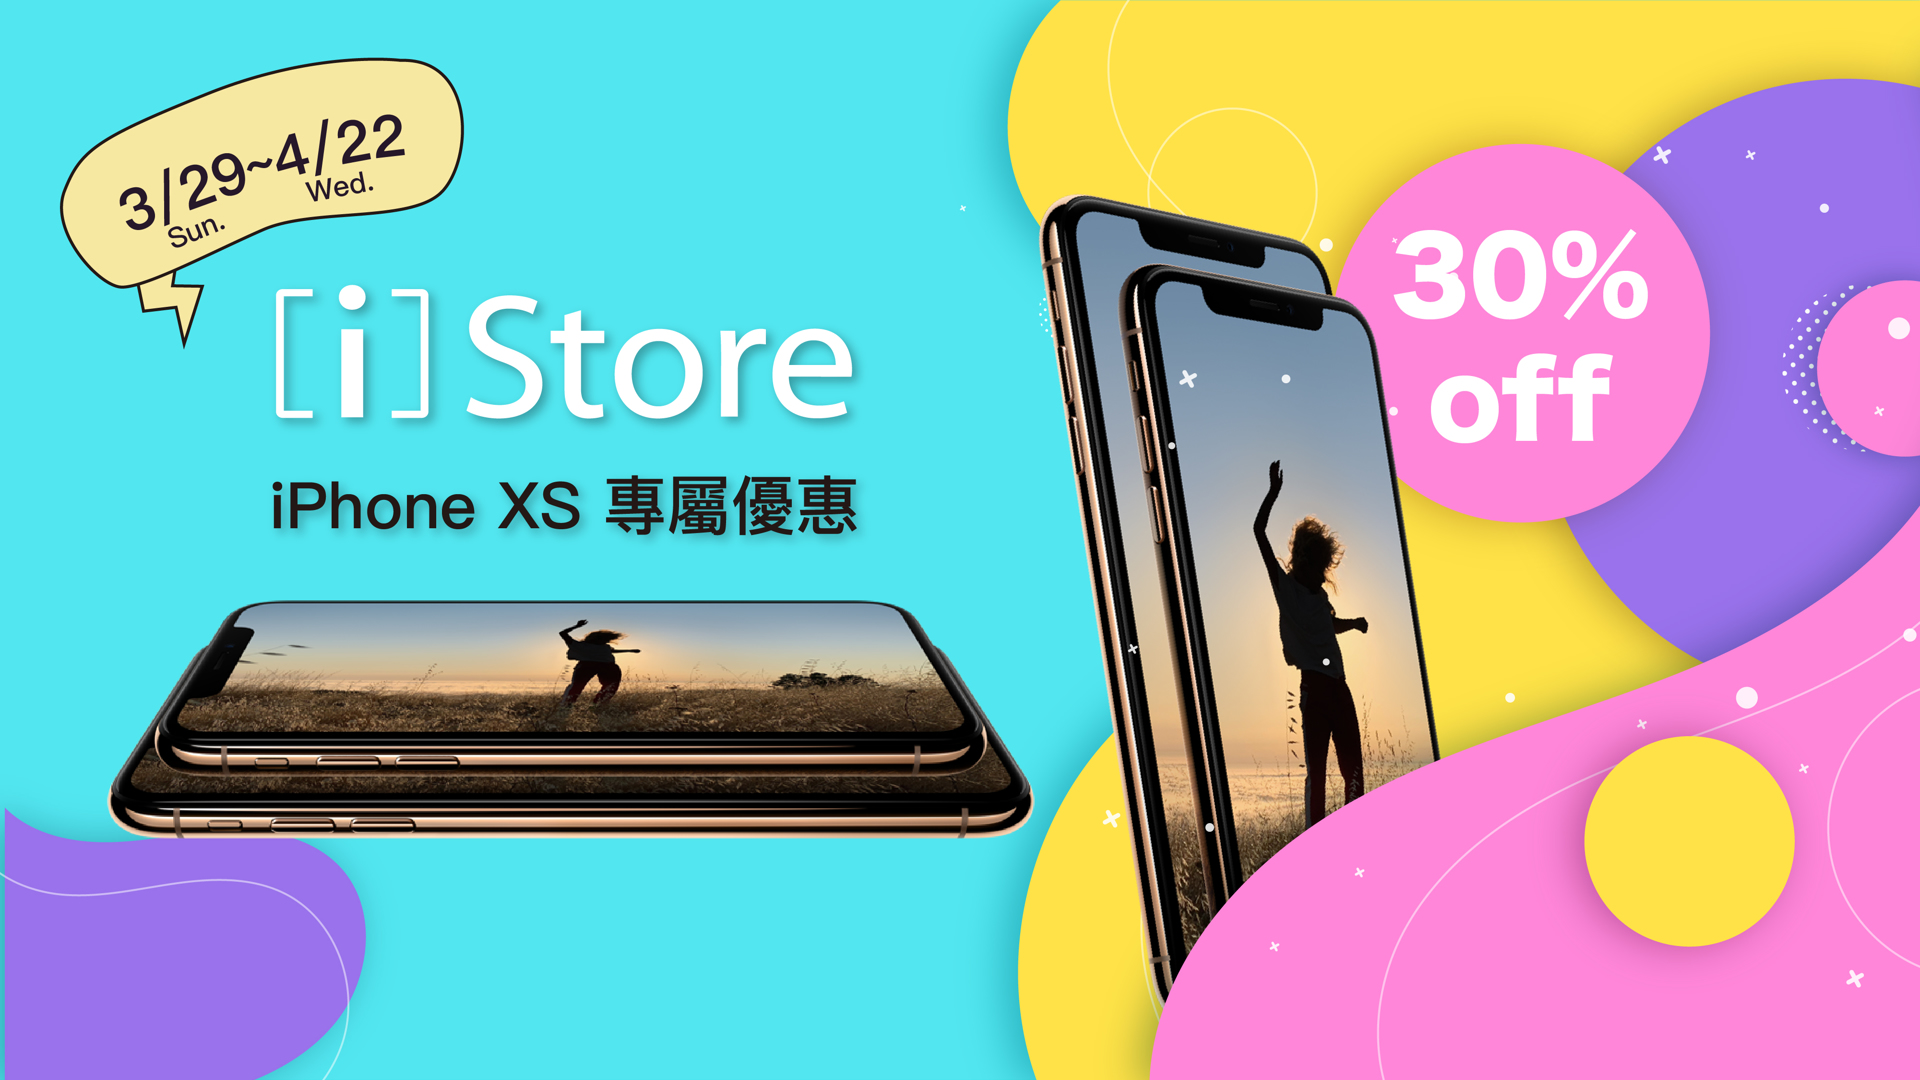 iPhone XS 系列7折